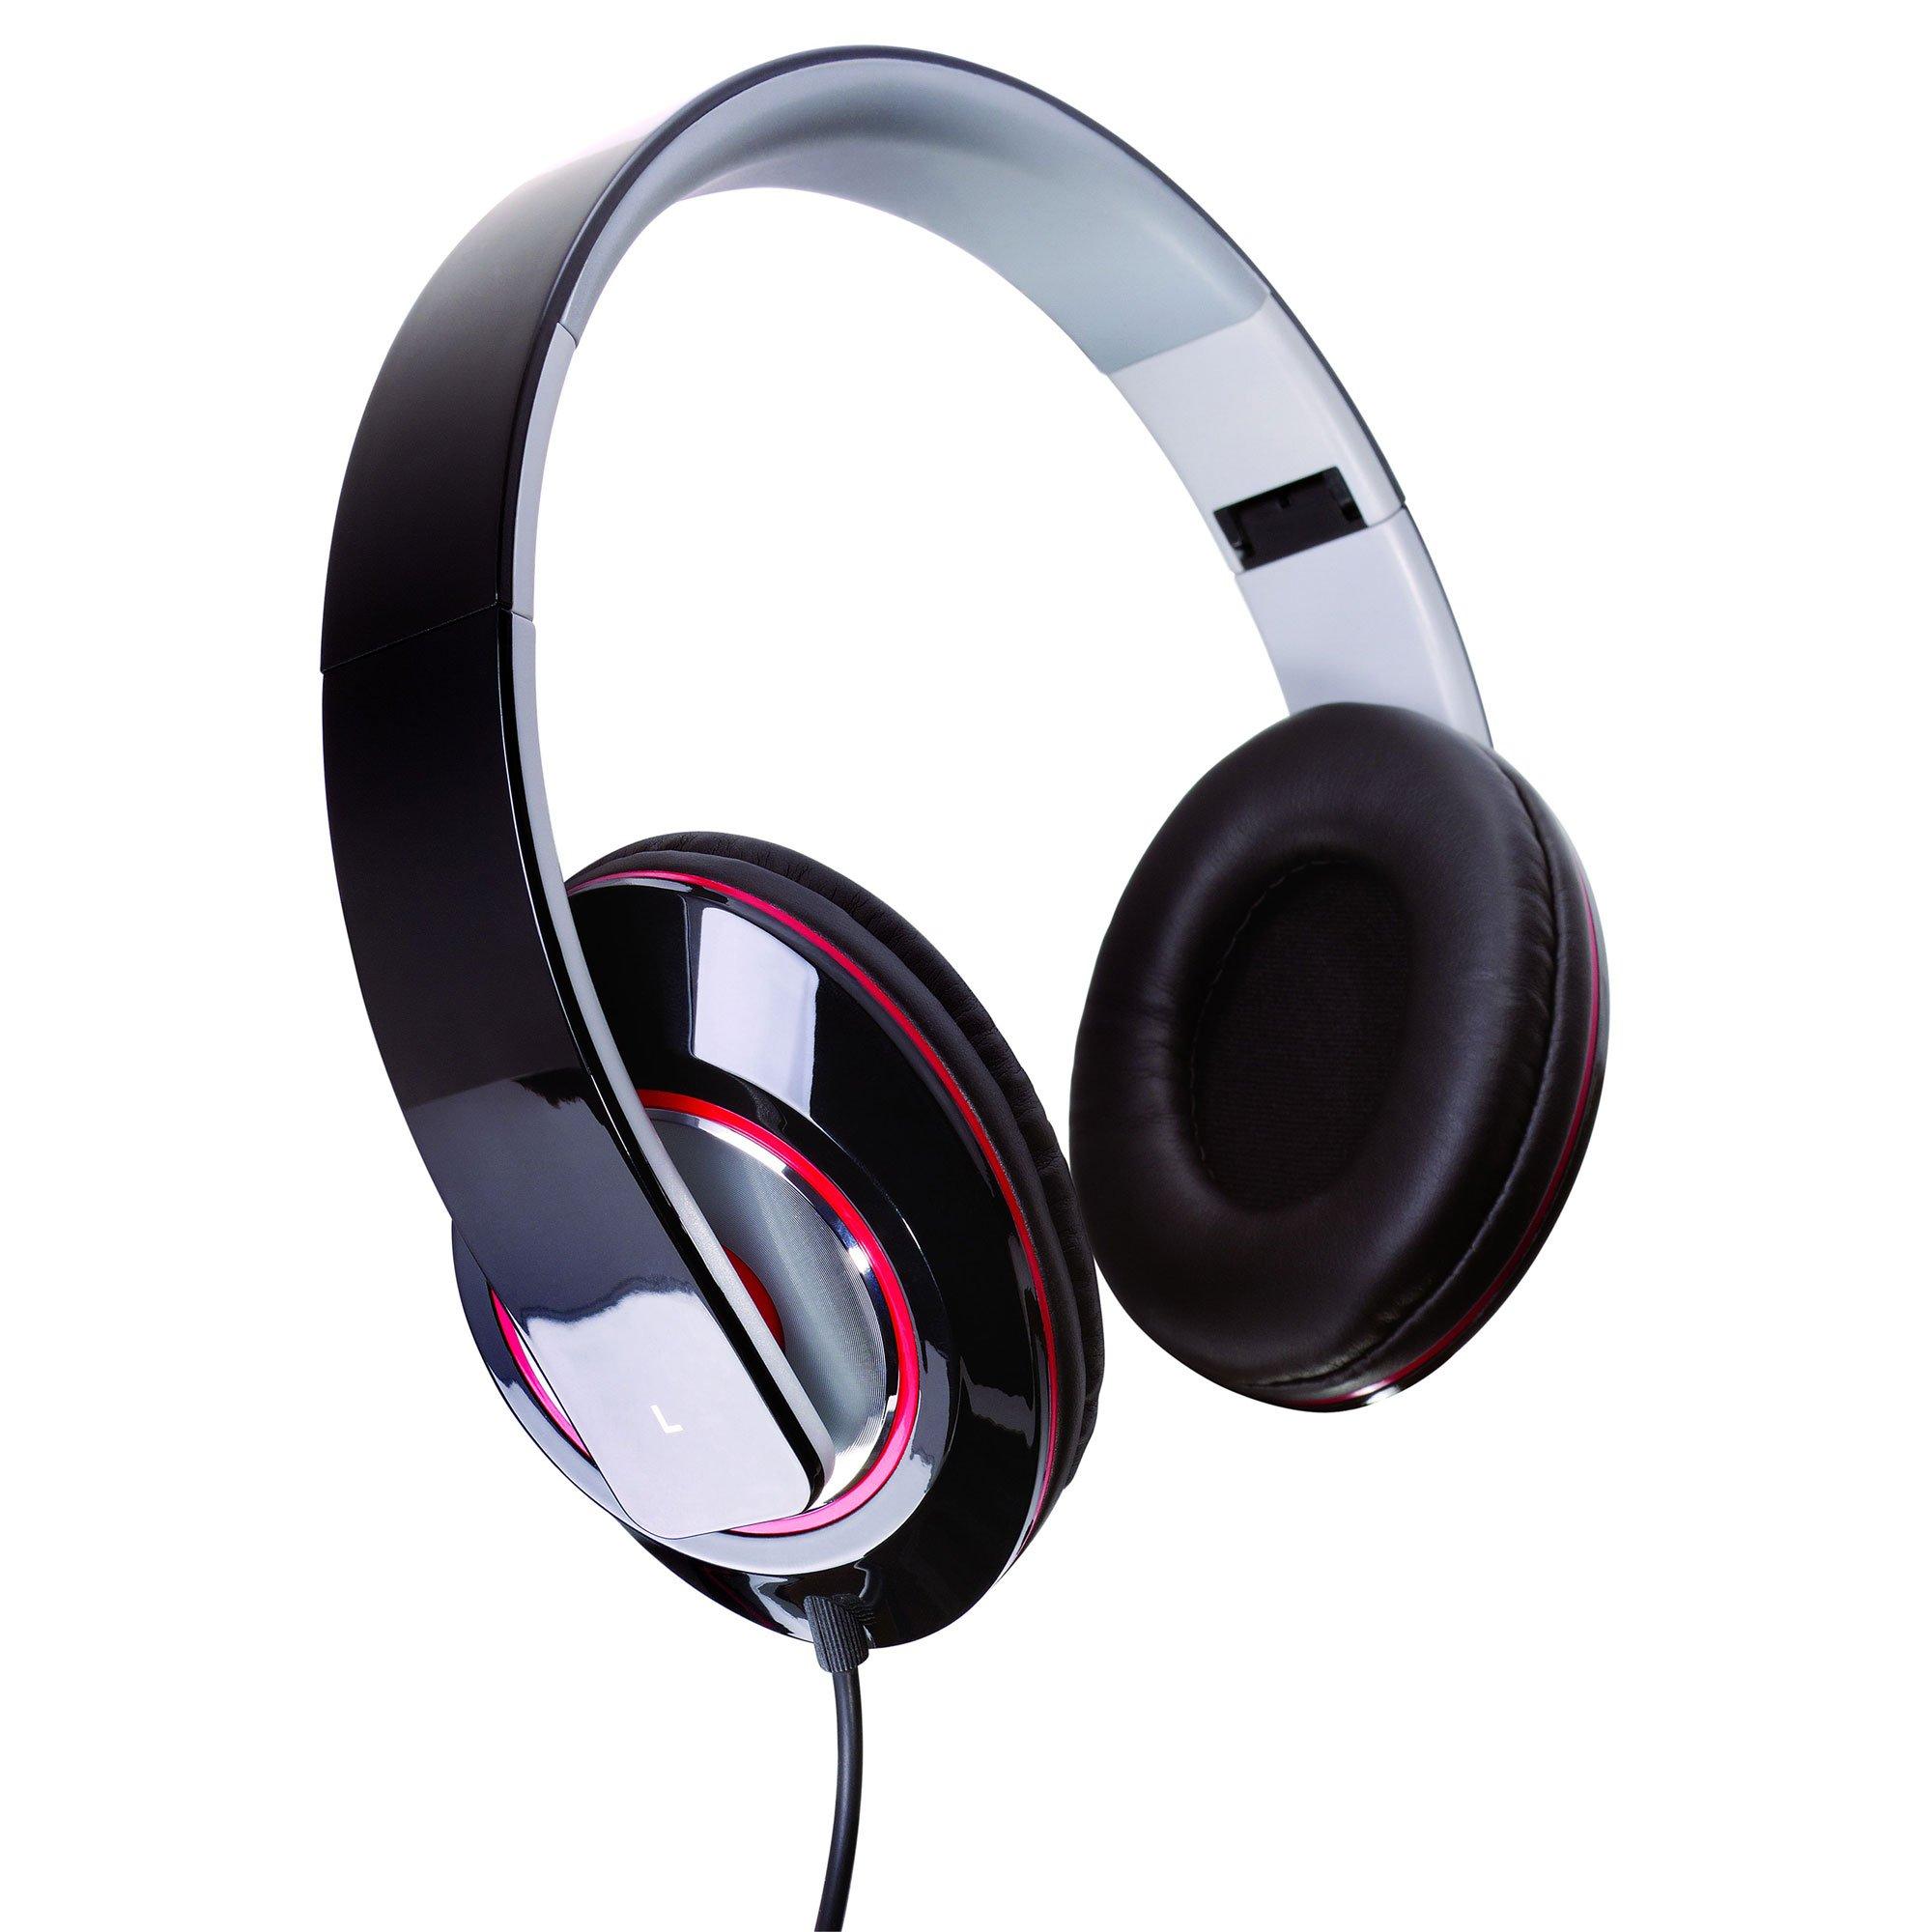 Sunbeam SBF-2012 Stereo Bass Foldable Headphones - Black